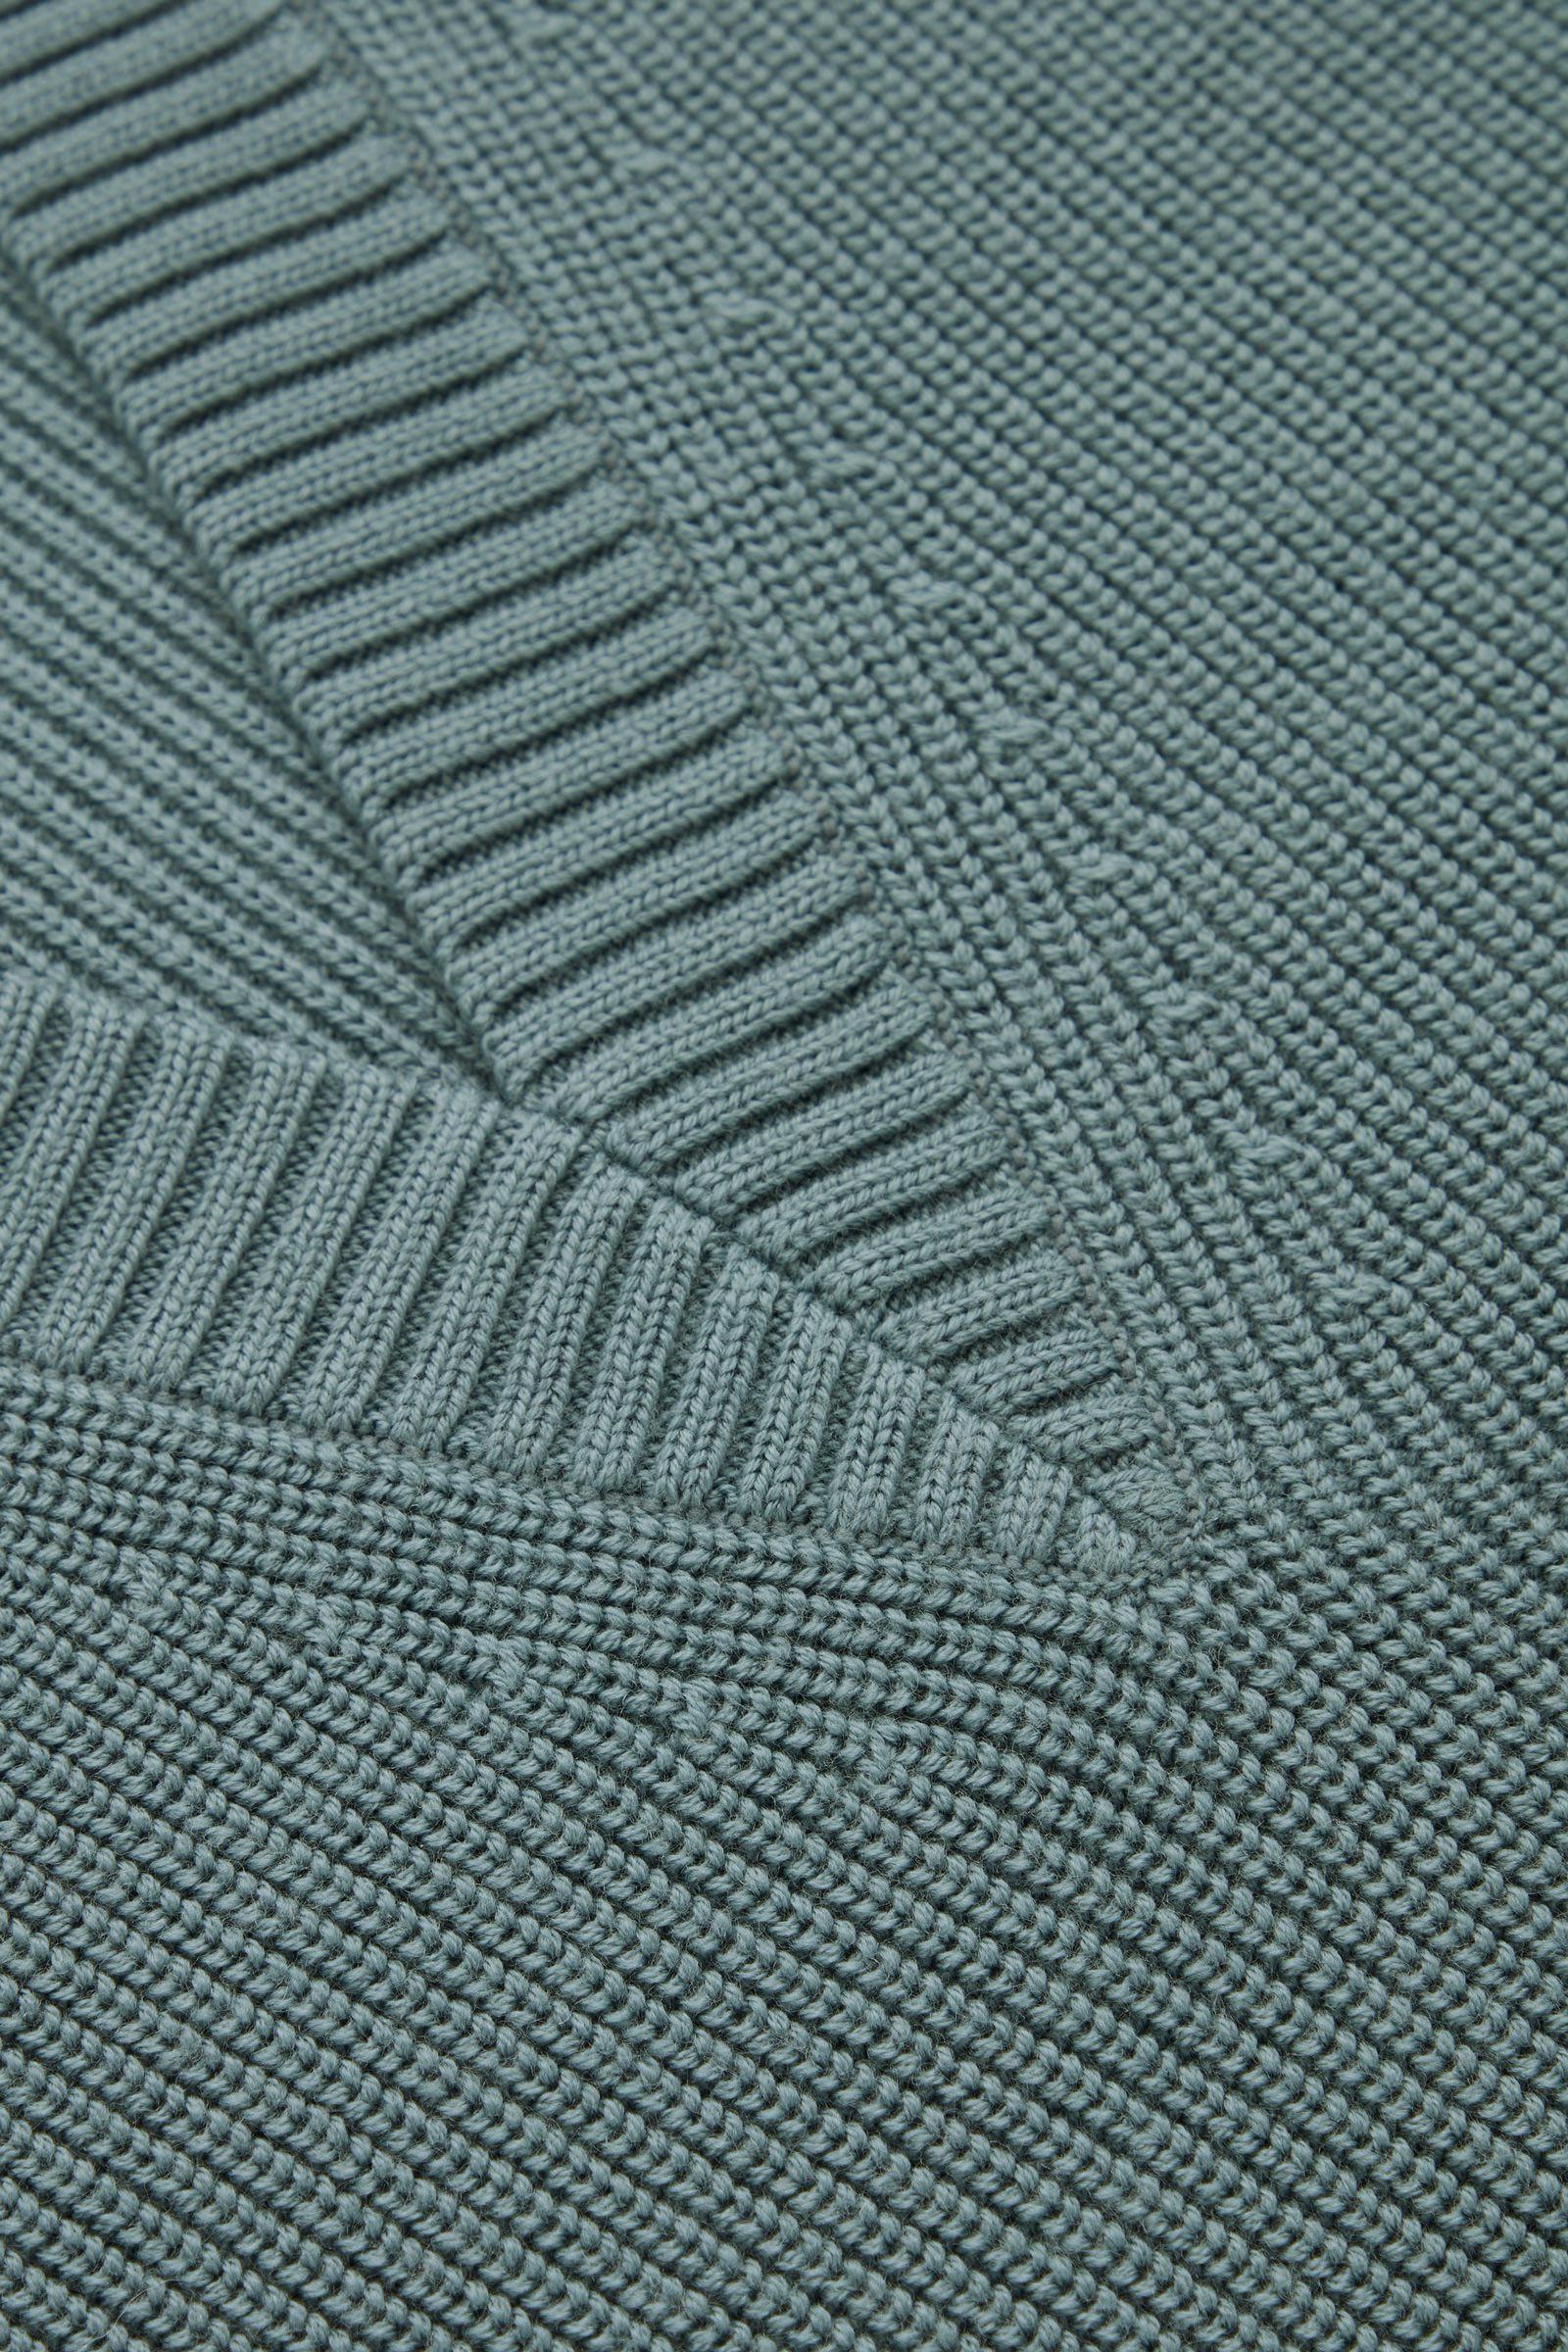 COS 딥 브이넥 니티드 베스트의 터쿼이즈컬러 Detail입니다.